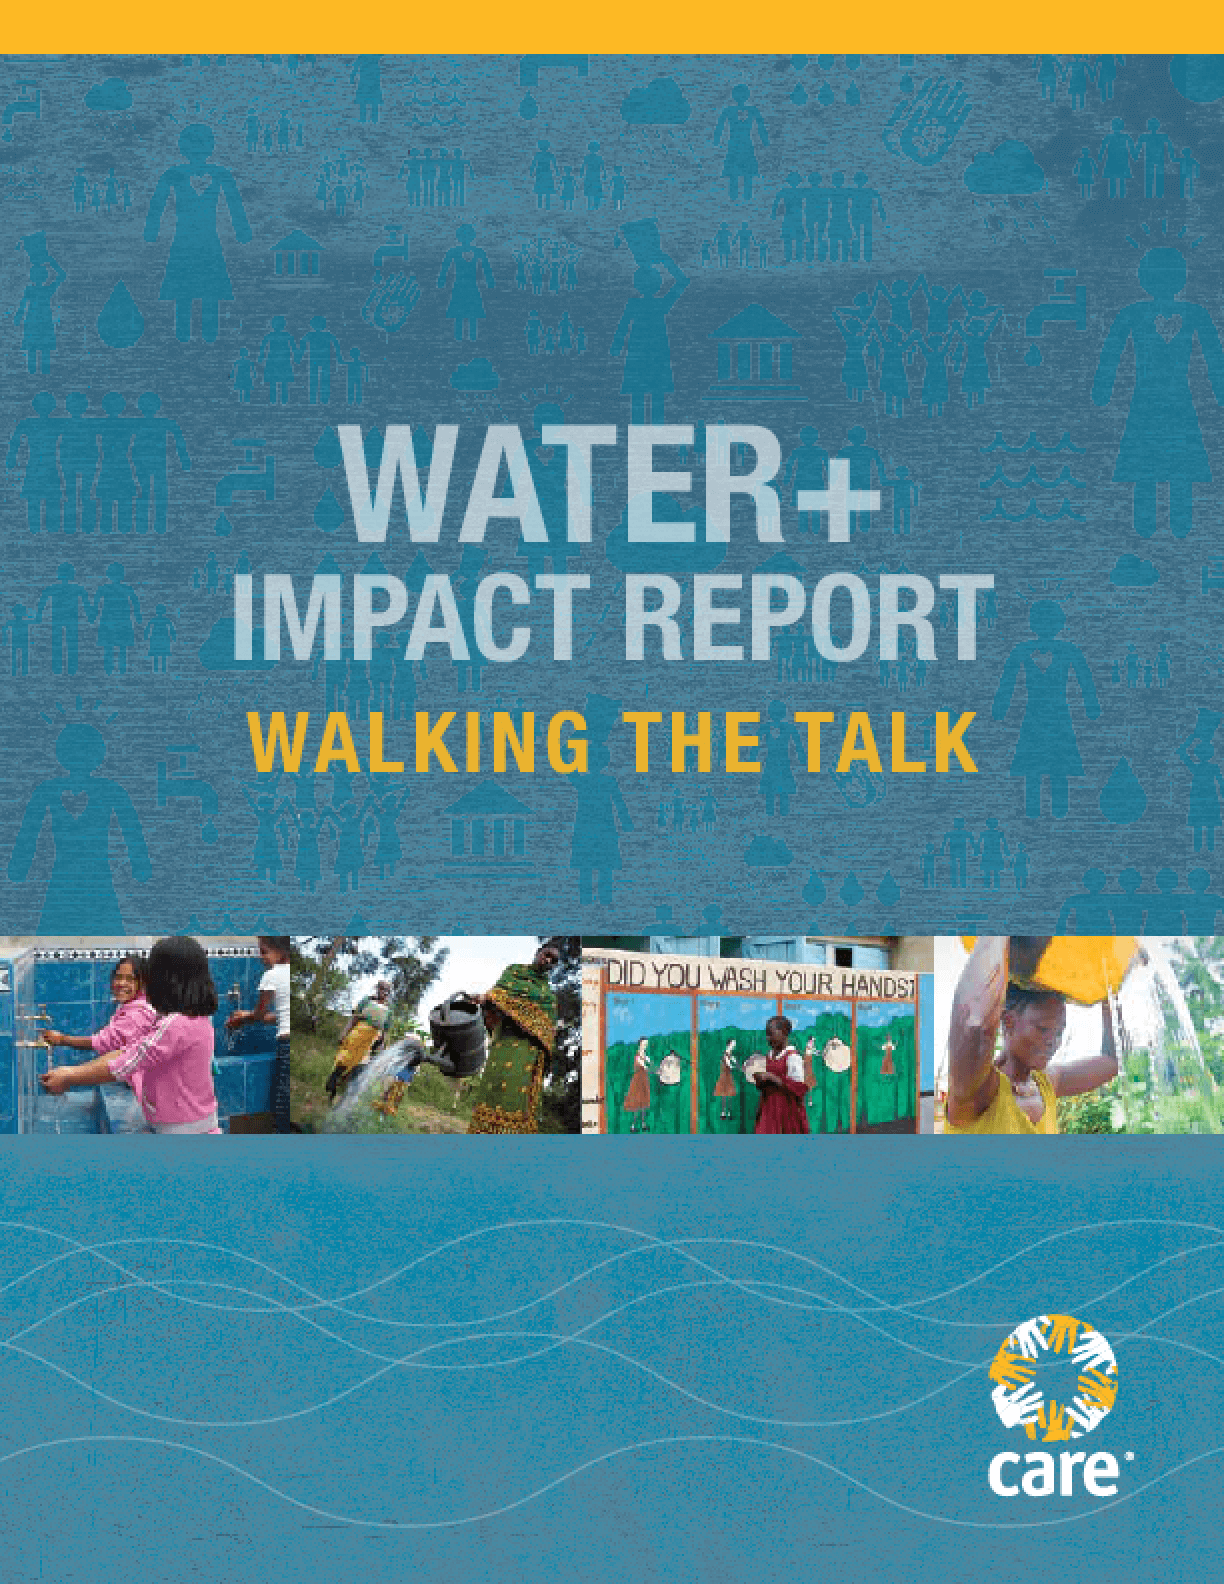 Water+ Impact Report: Walking the Talk